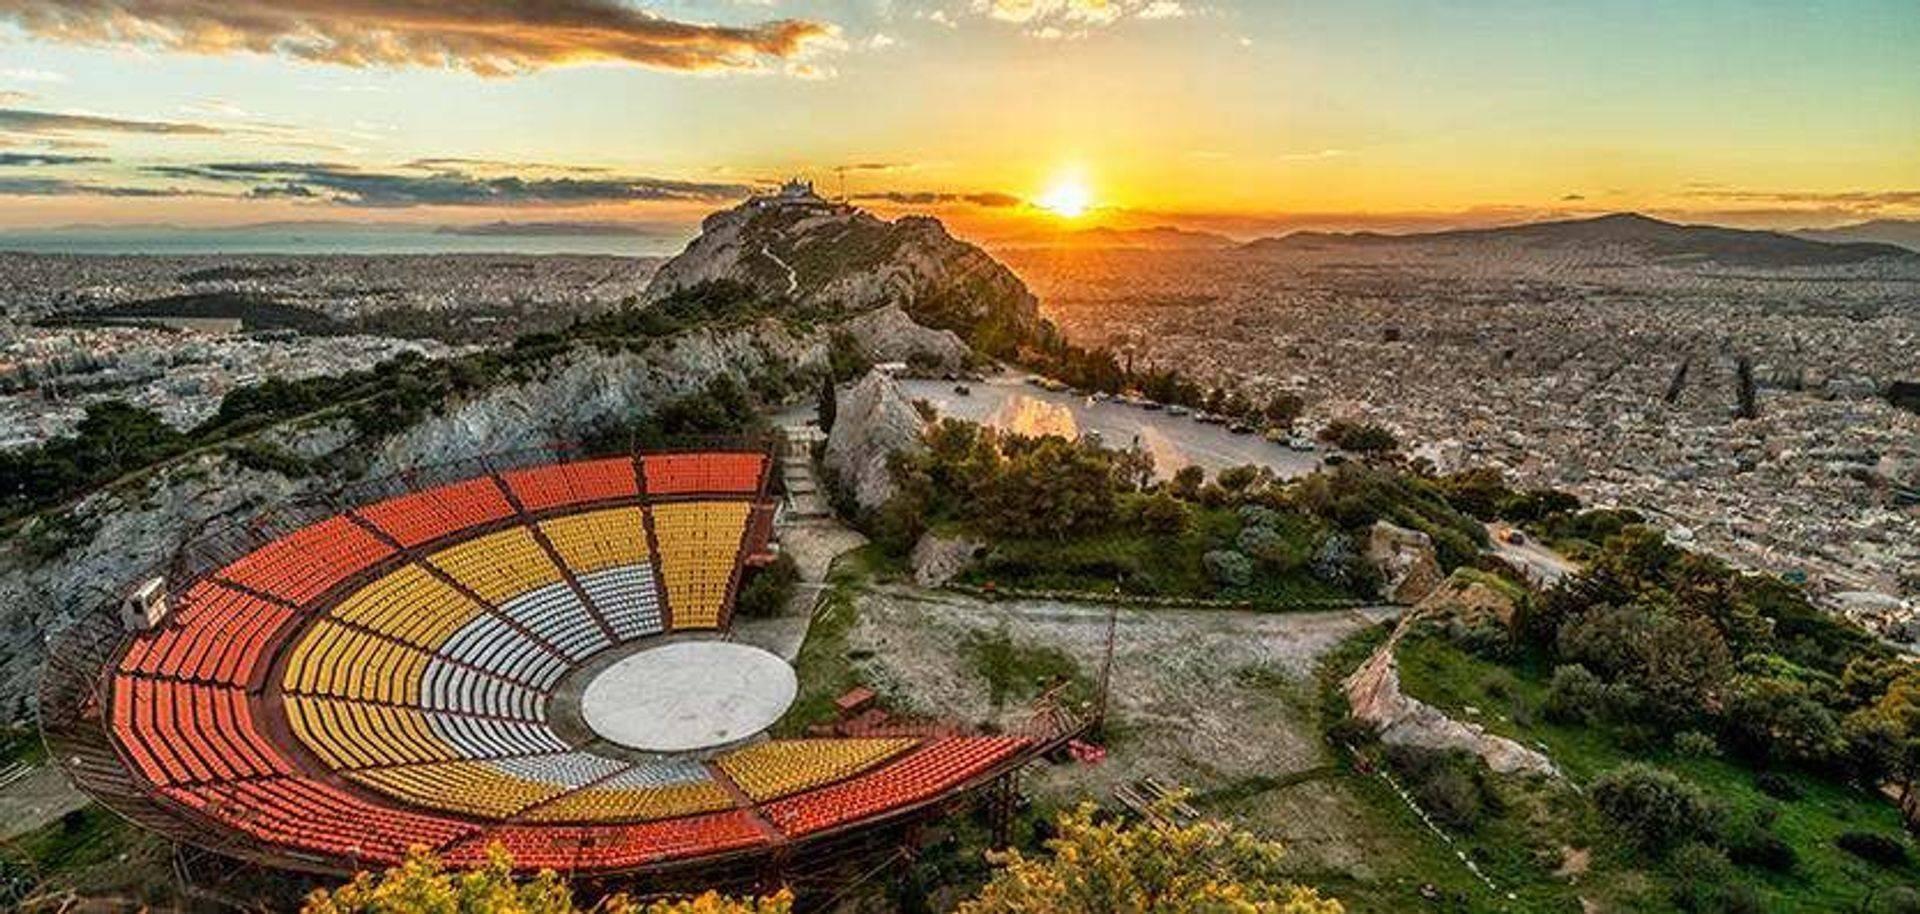 Birdwatching, number one destination is Greece, by greek2m